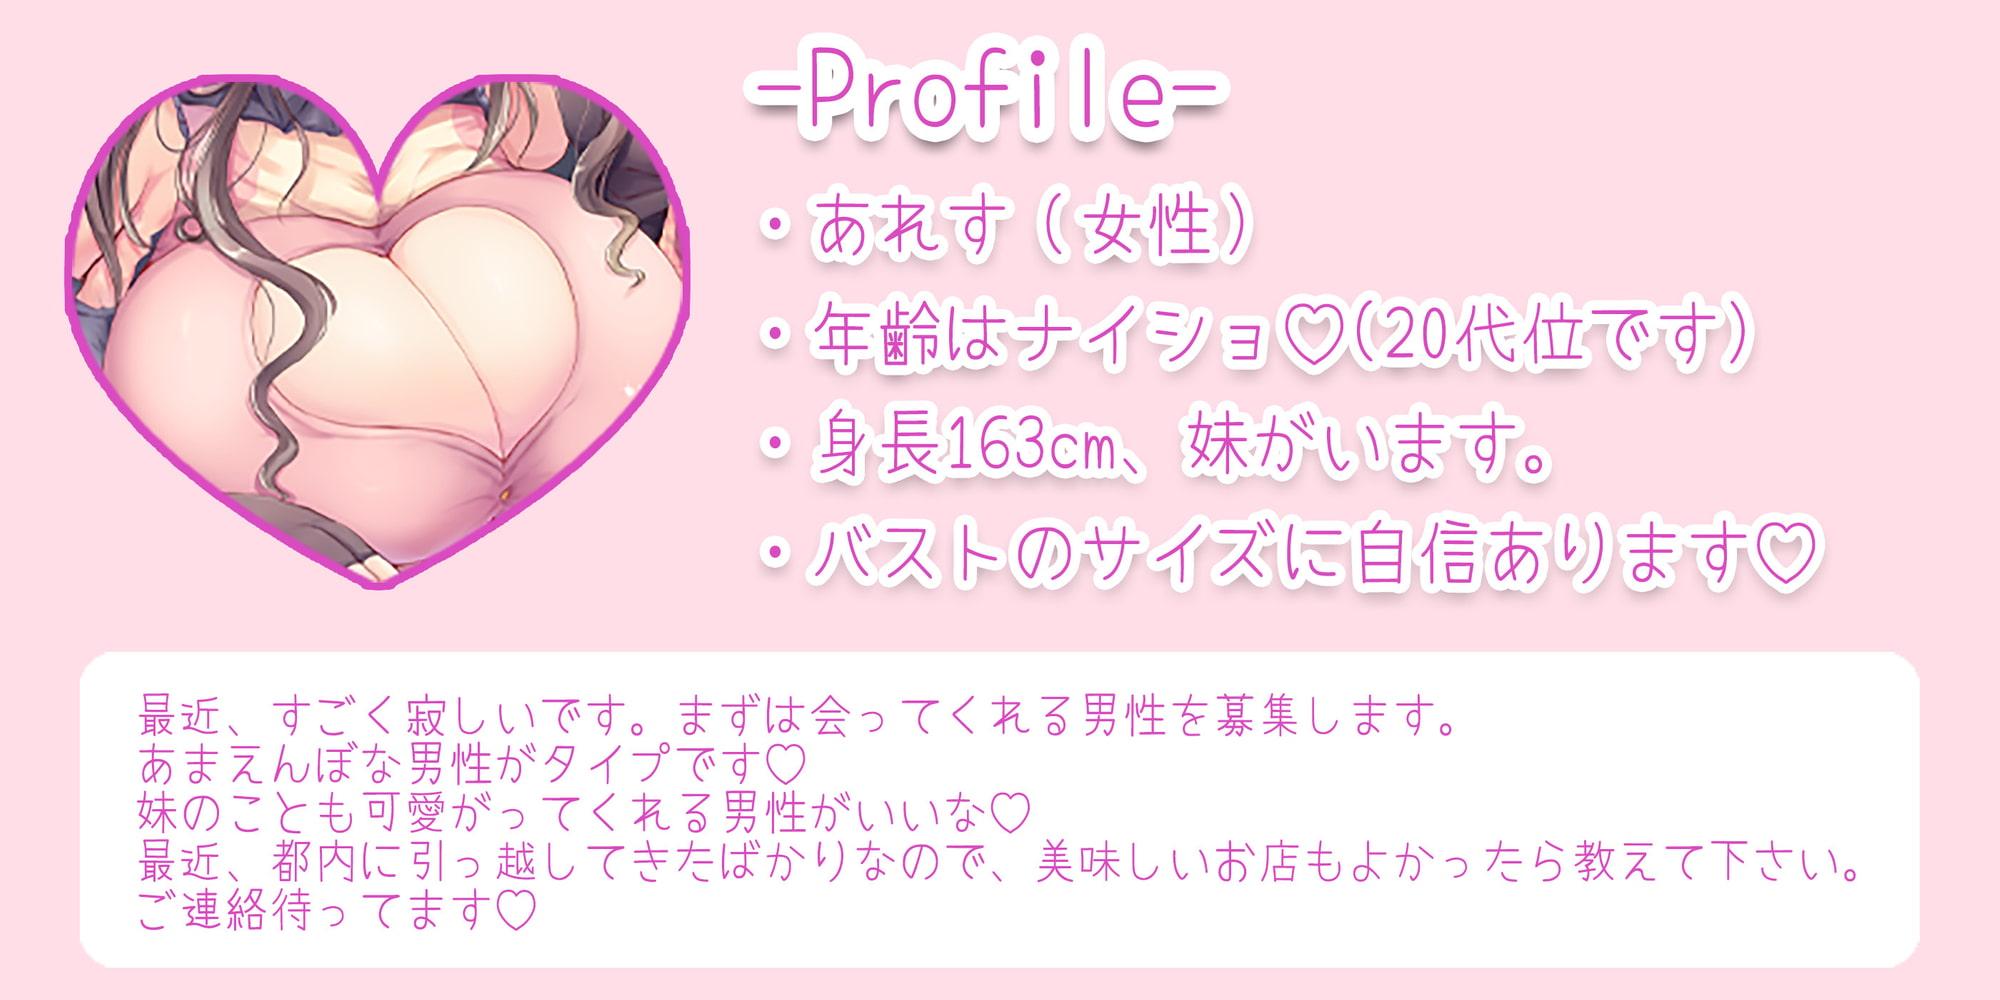 【KU100】サキュバス姉妹の耳奥舐めぐちゅぐちゅディナーショー